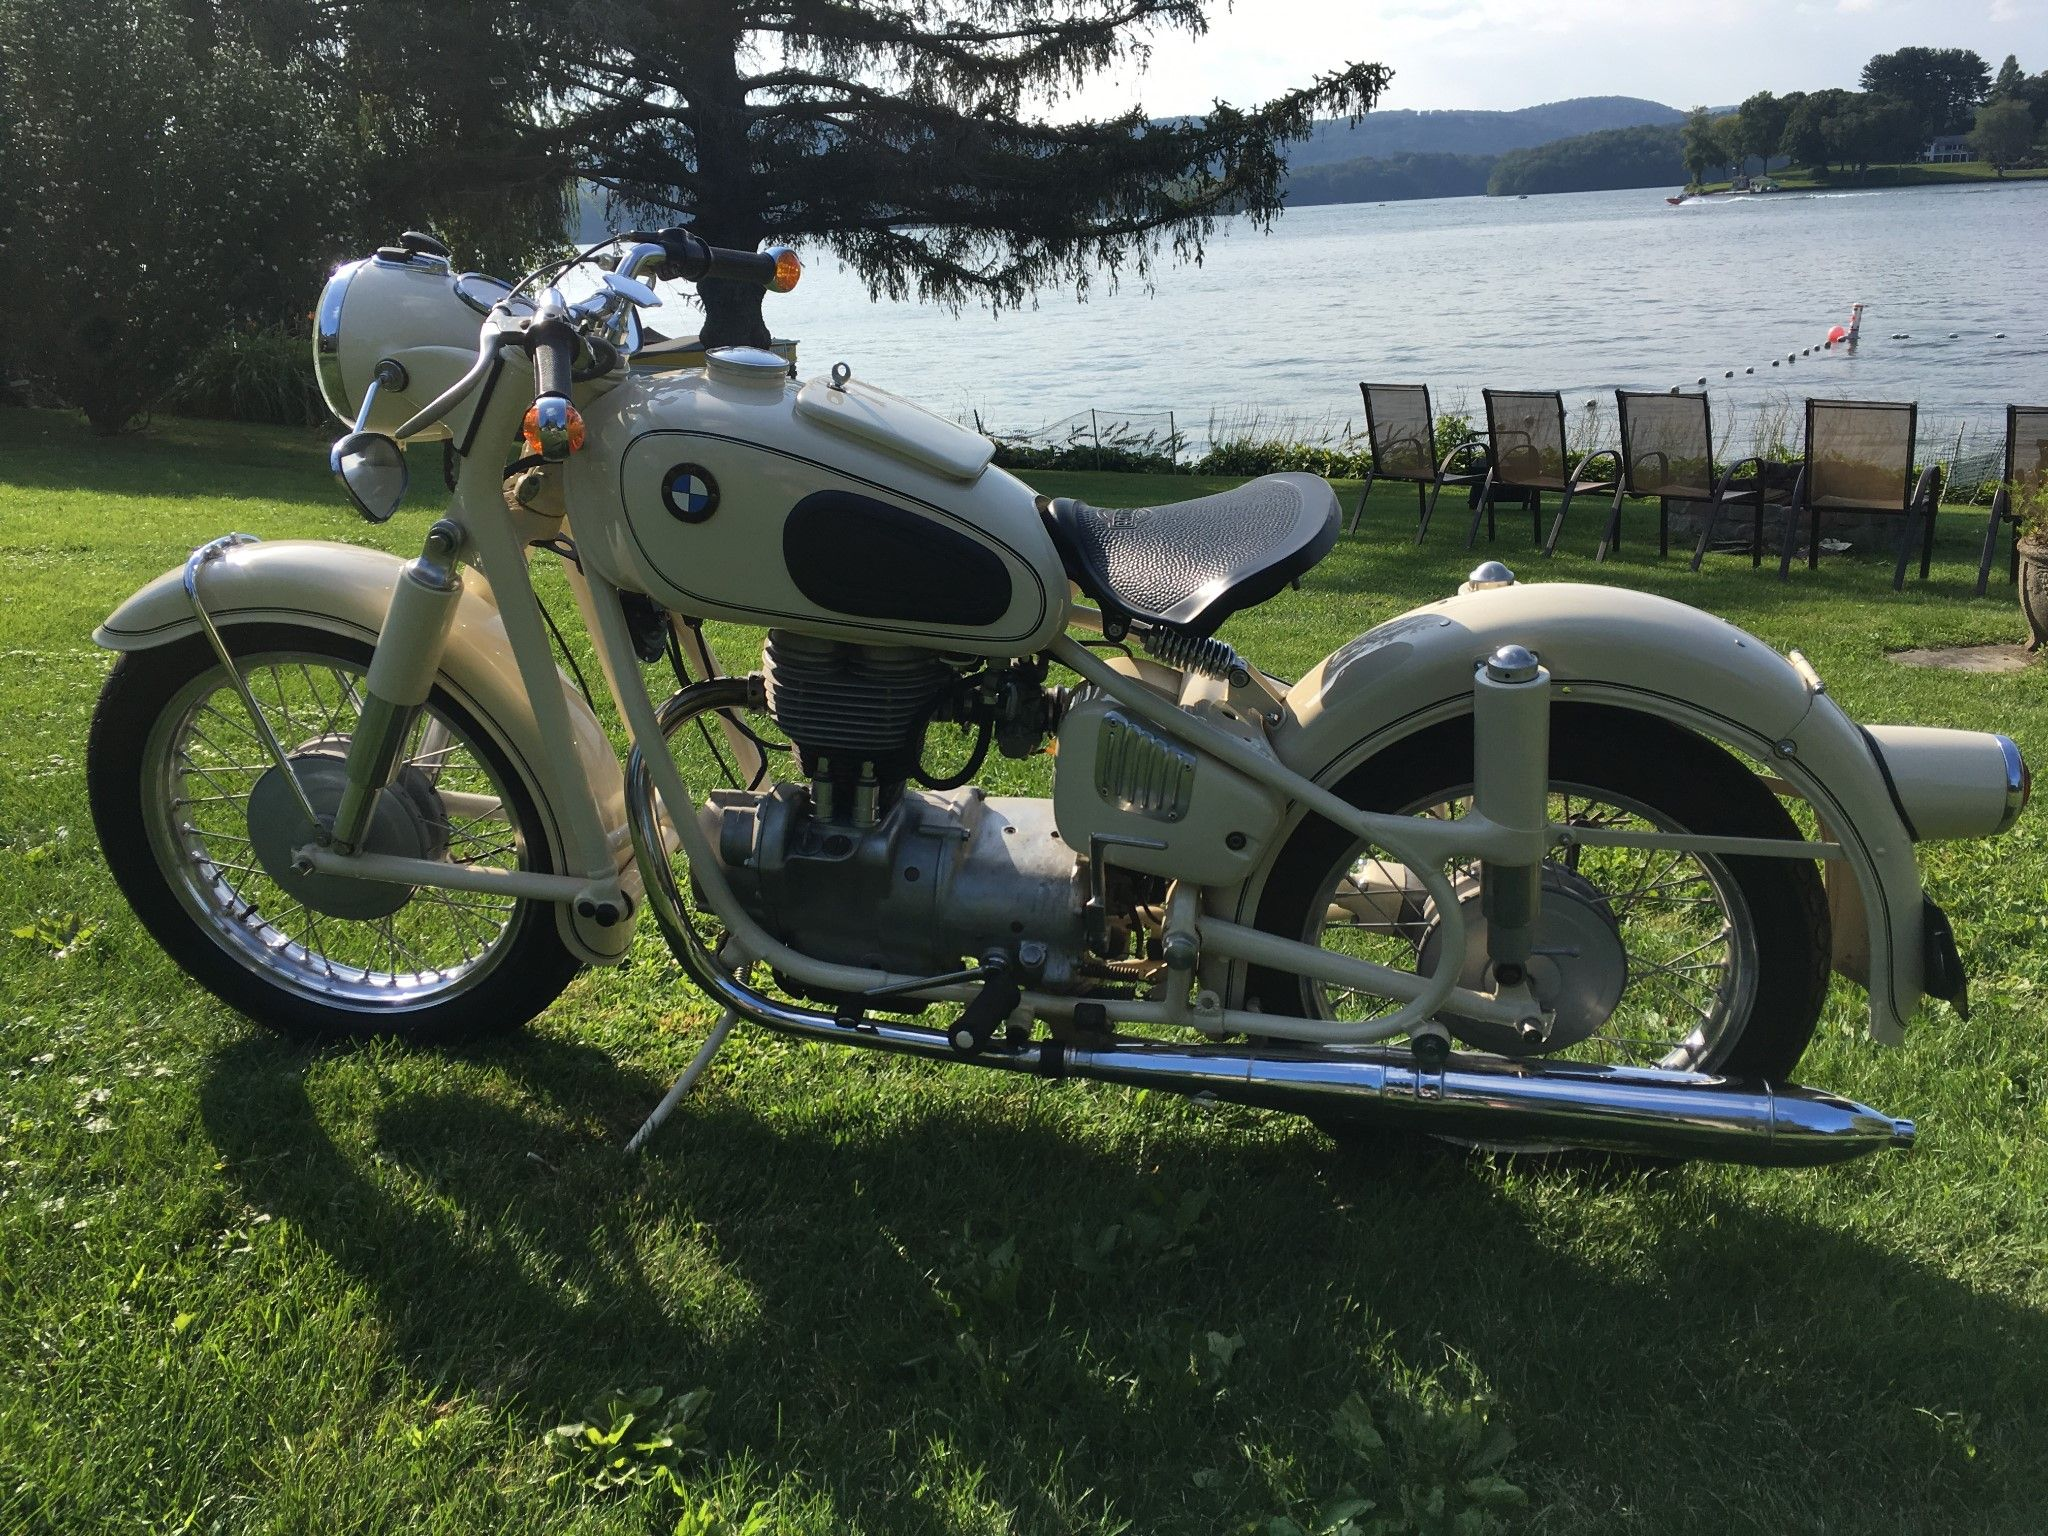 1964 BMW R27 | Bmw, Engine rebuild, Motorcycle